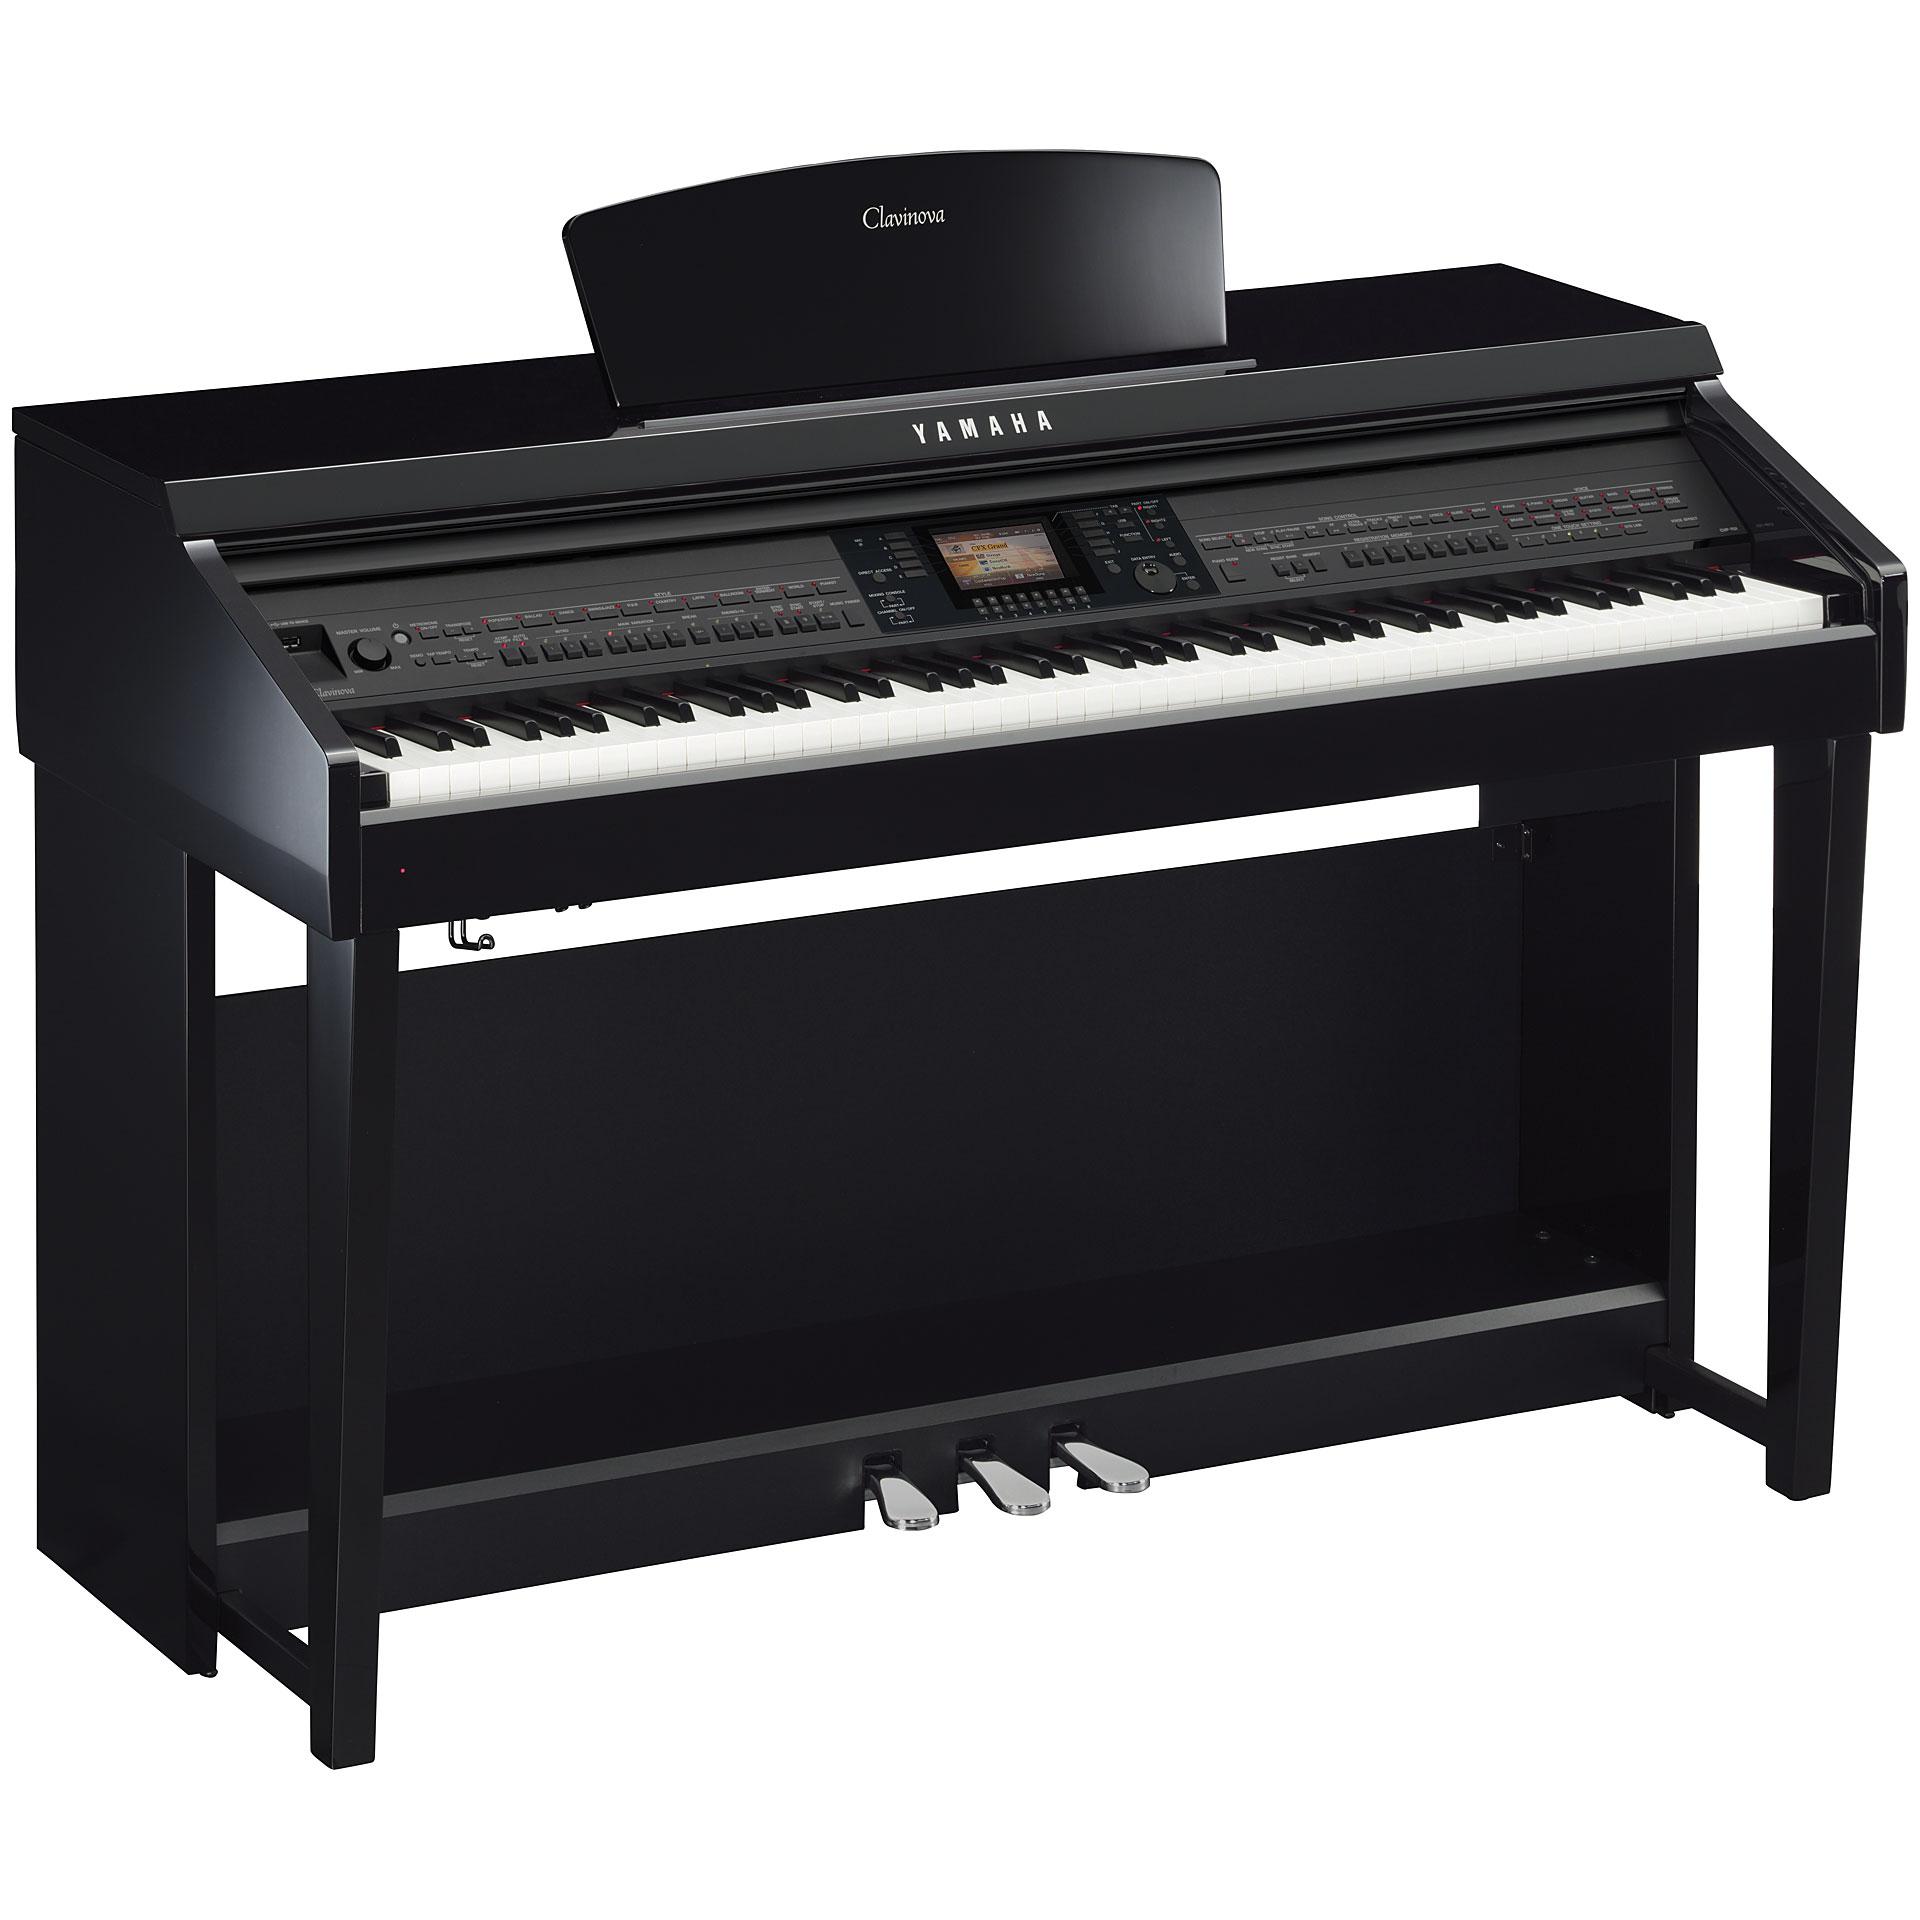 Yamaha clavinova cvp 701 pe piano digital for Certified yamaha outboard service near me